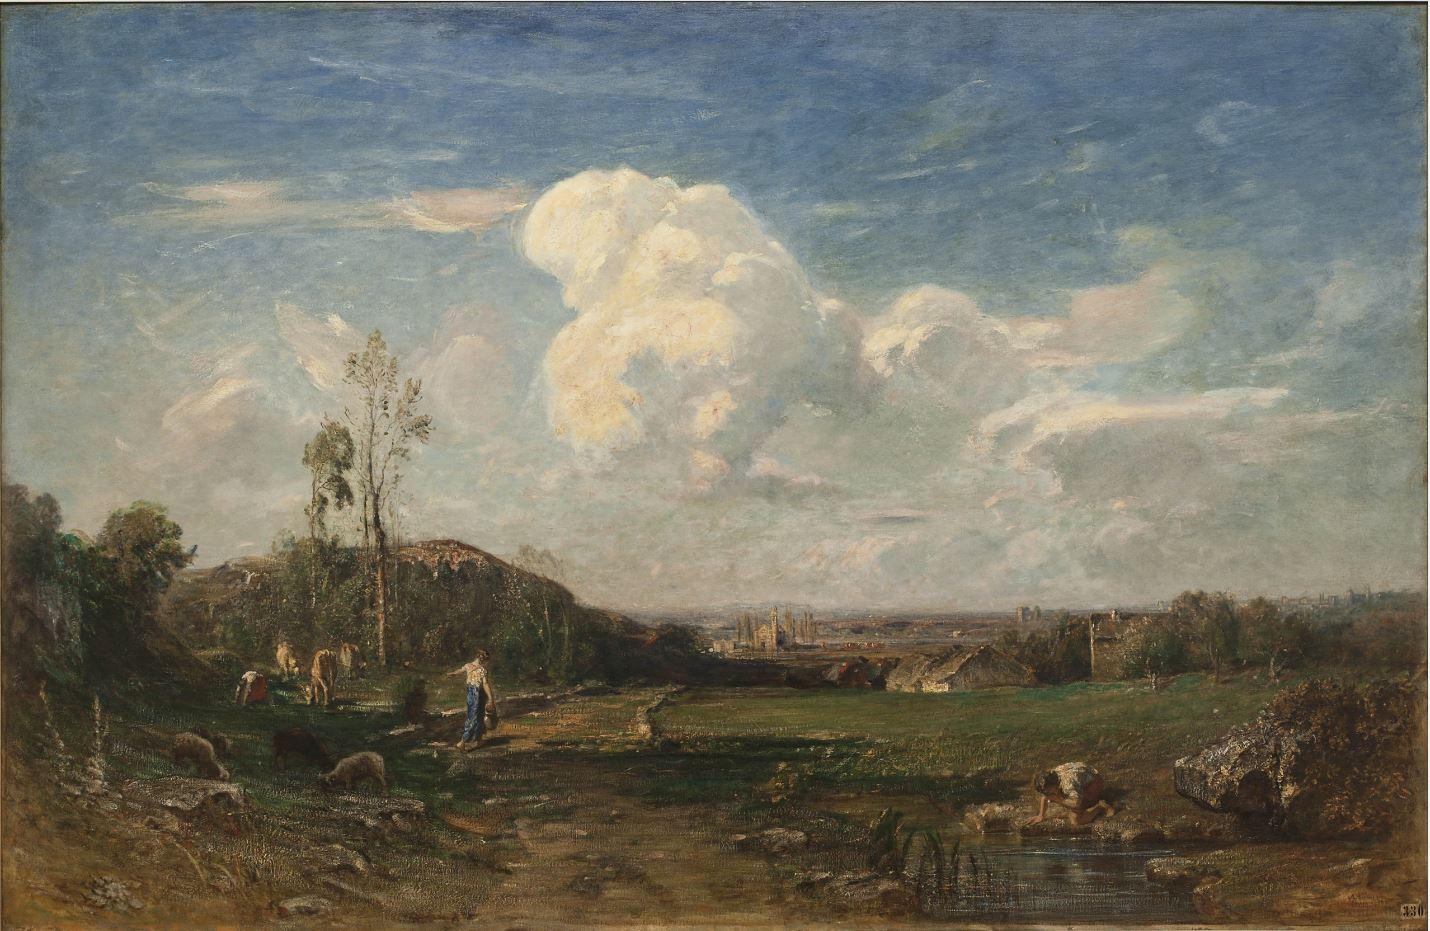 Antonio Fontanesi, Le nubi (1880; olio su tela, 200 x 300 cm; Torino, GAM - Galleria Civica d'Arte Moderna e Contemporanea)